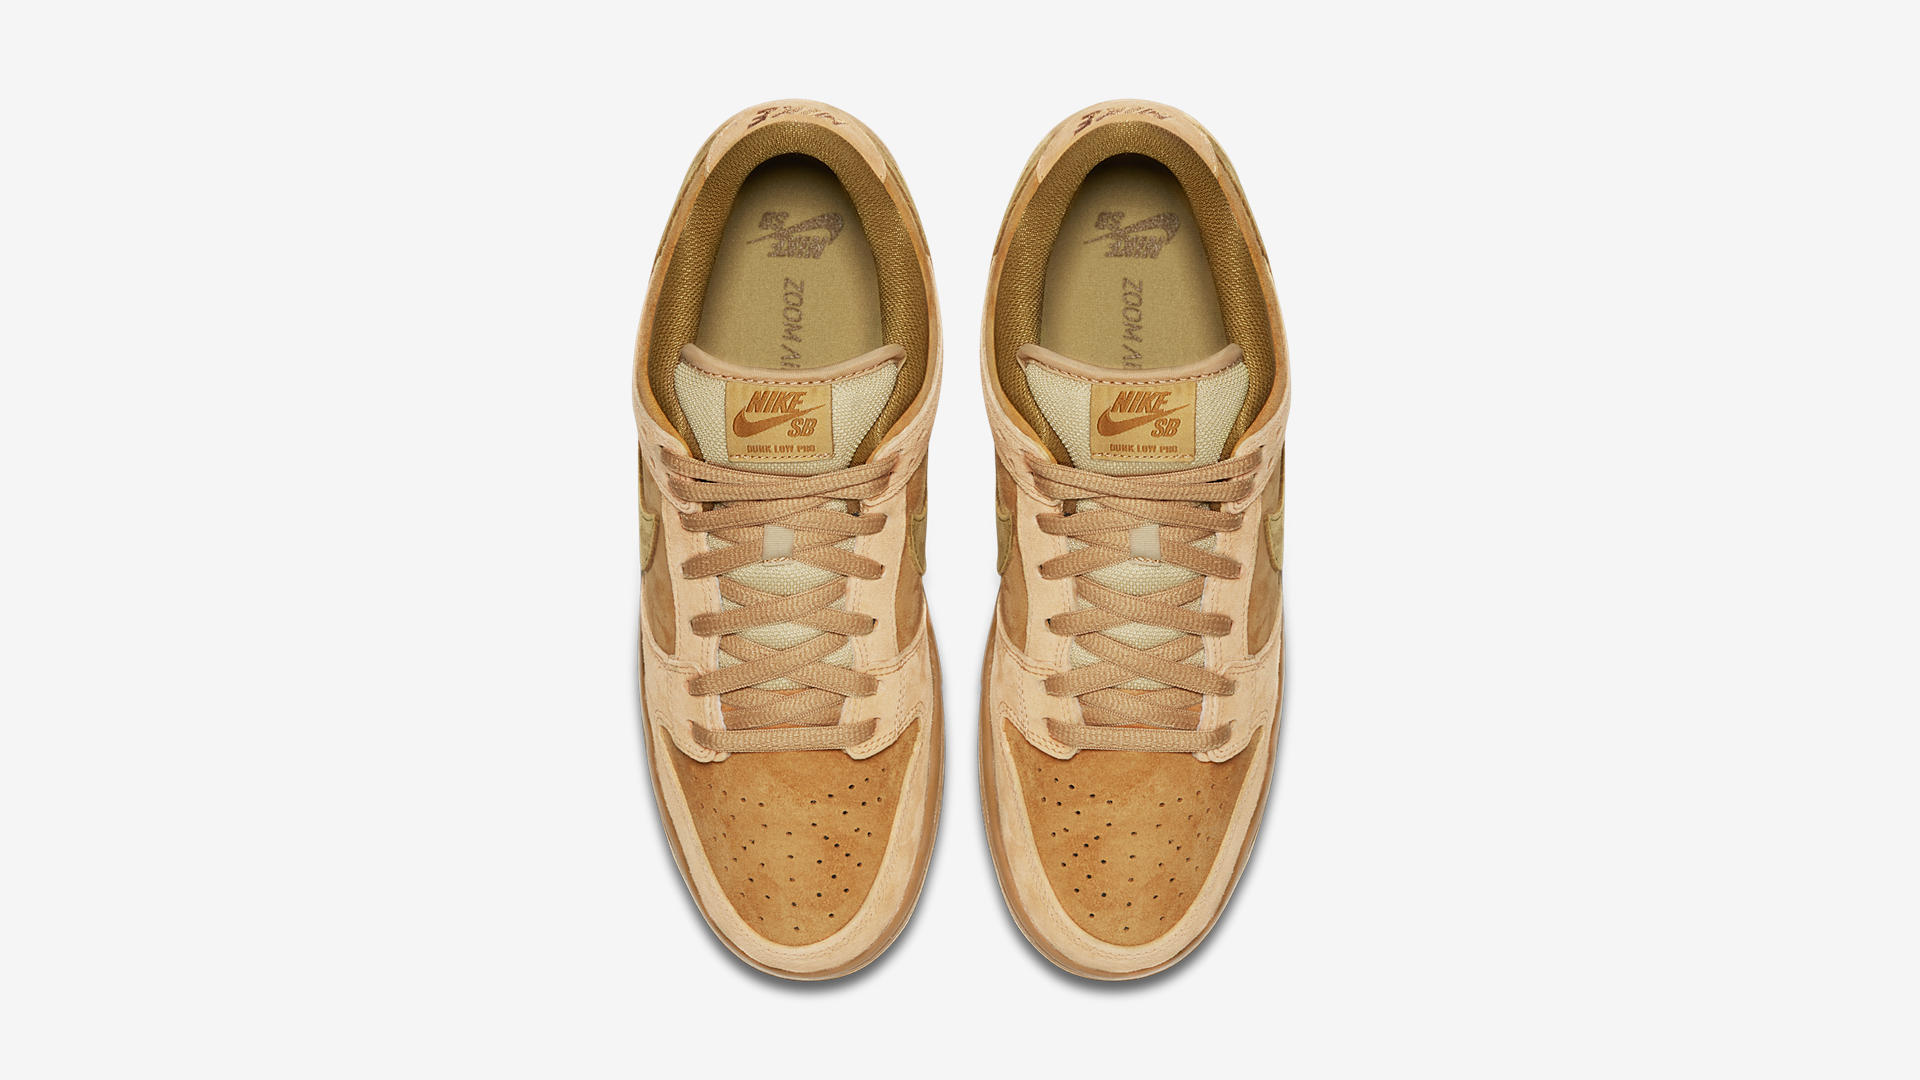 Nike SB Dunk Low Pro Wheat 883232 700 2